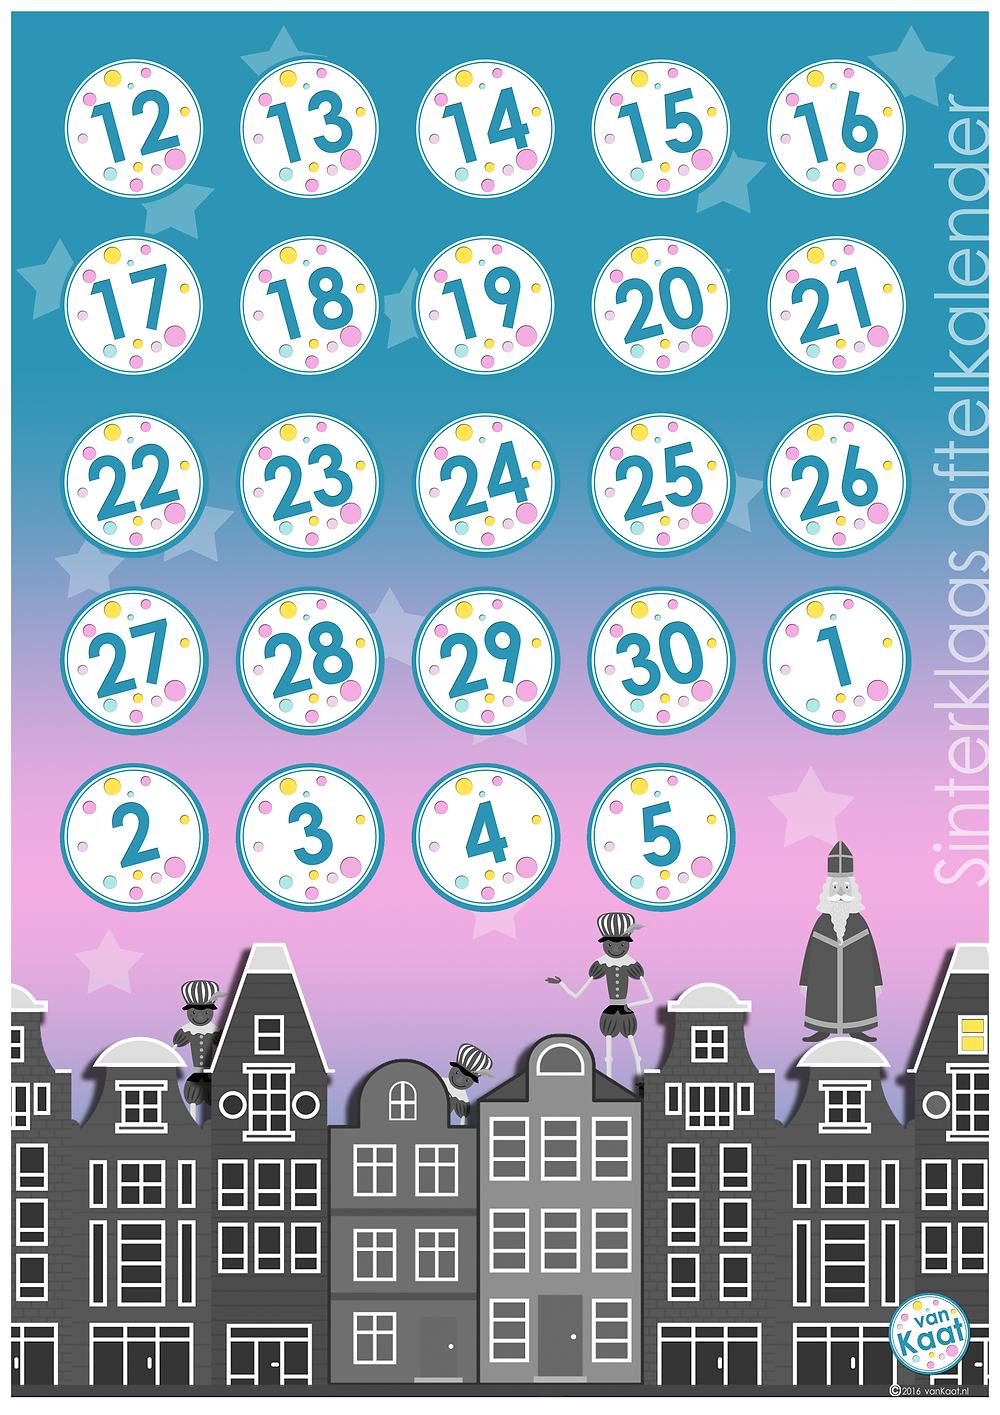 aftelkalender pakjesavondspel sinterklaas